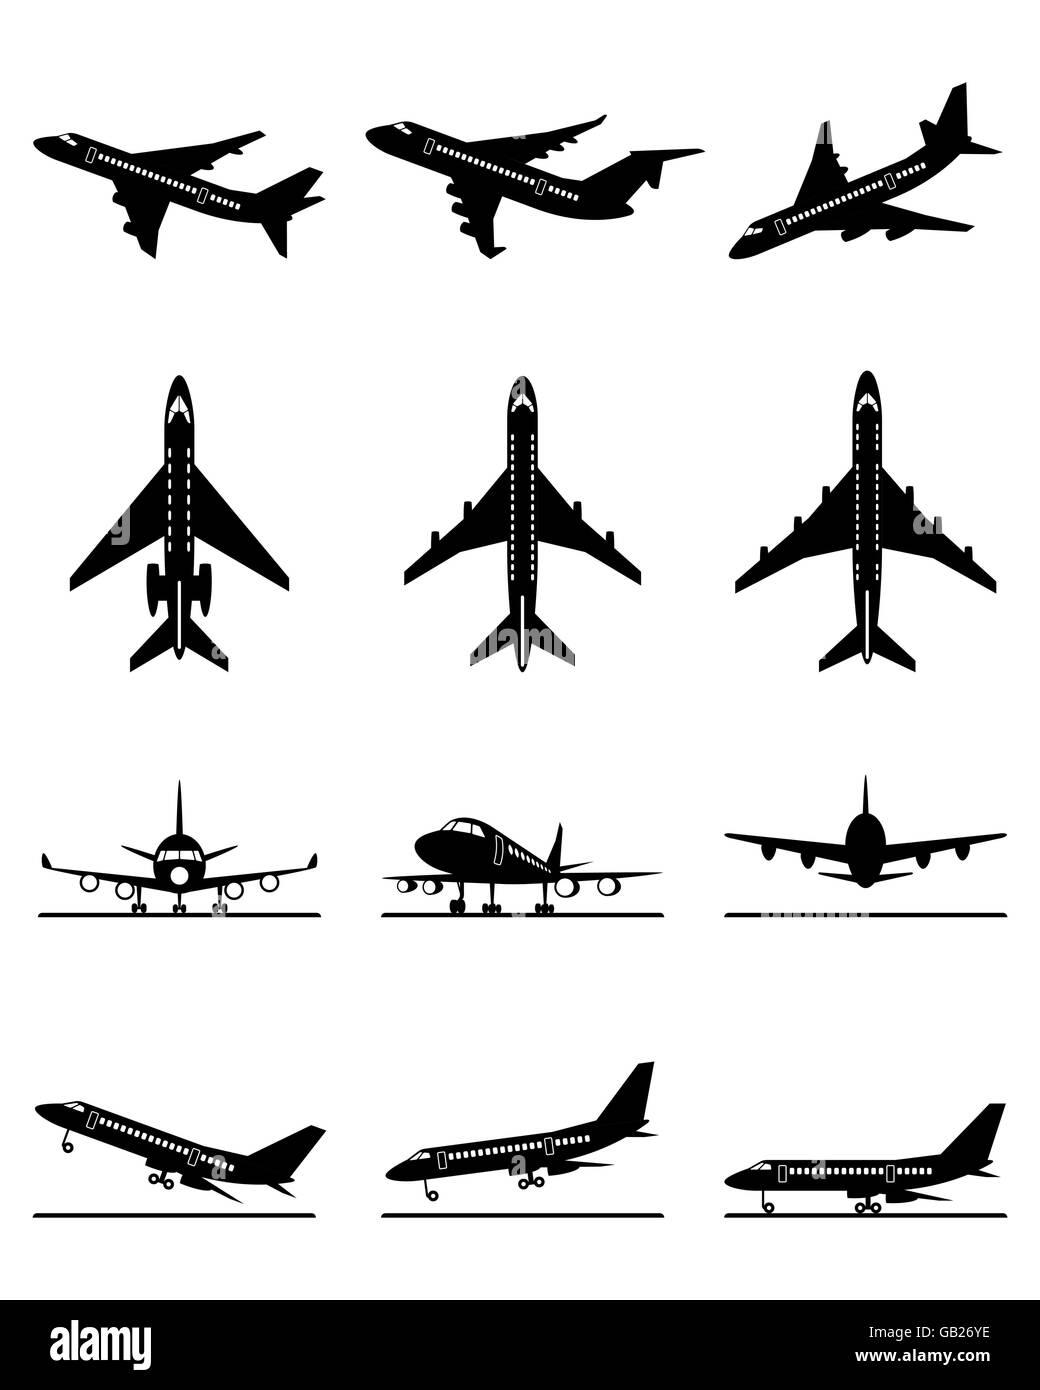 Different passenger aircrafts in flight - vector illustration - Stock Image